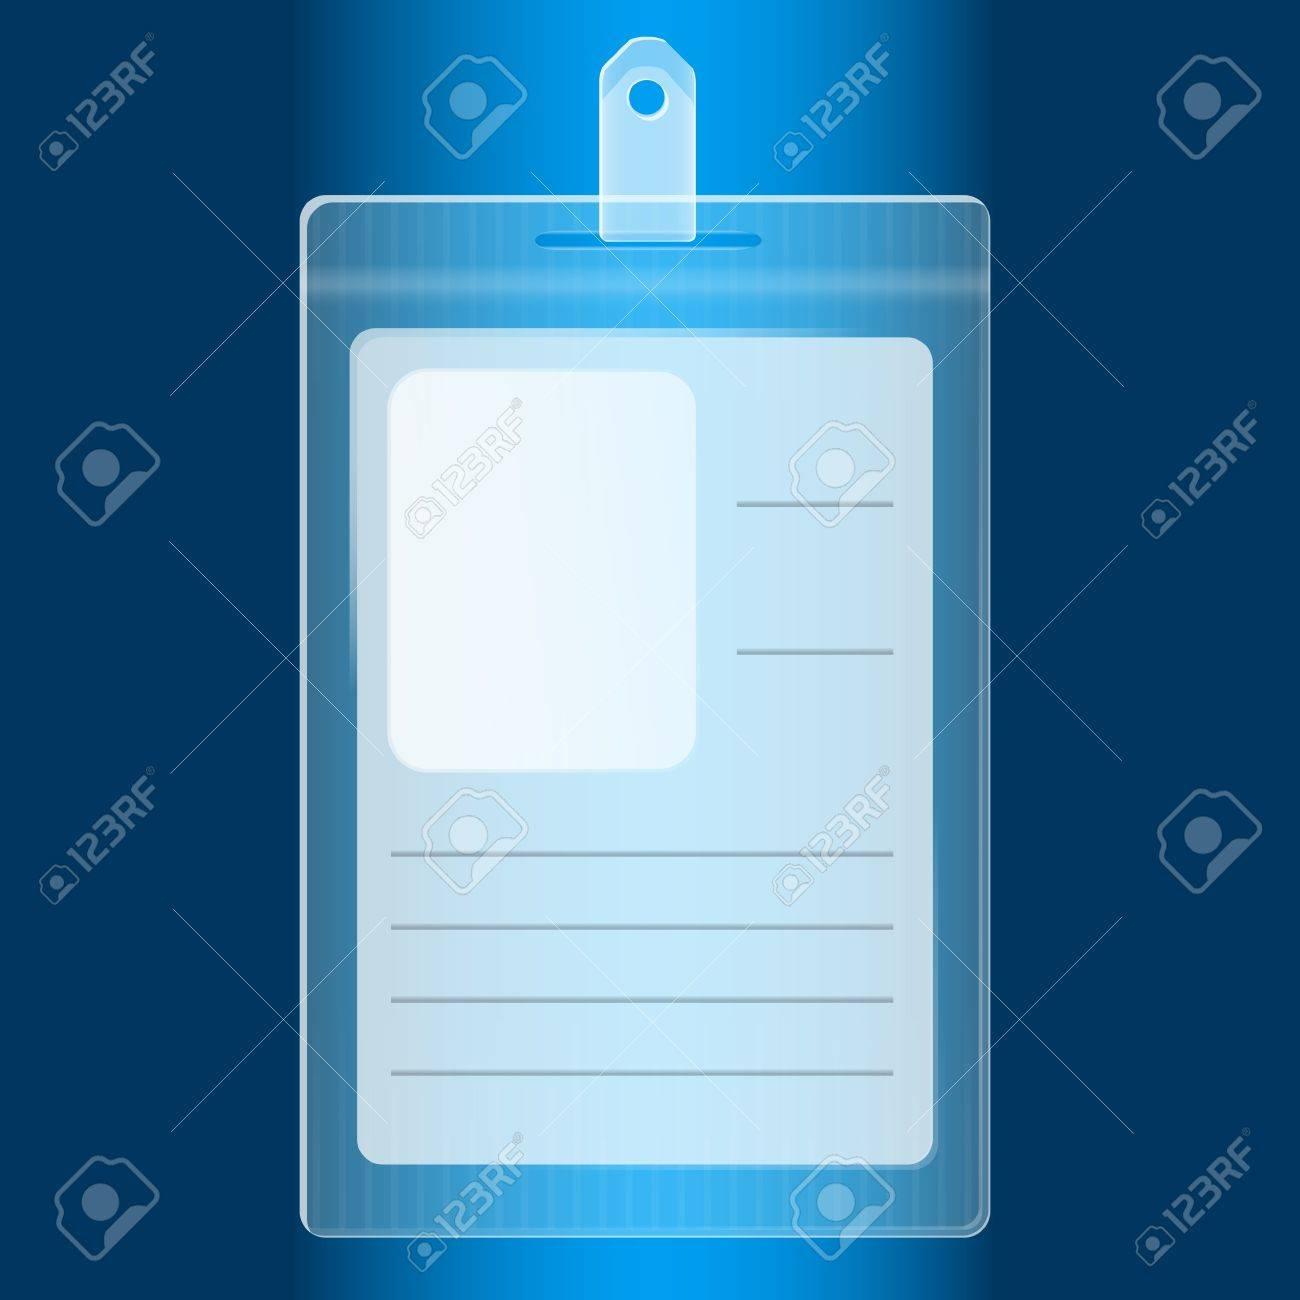 Illustration of empty blue plastic badge - 13543310